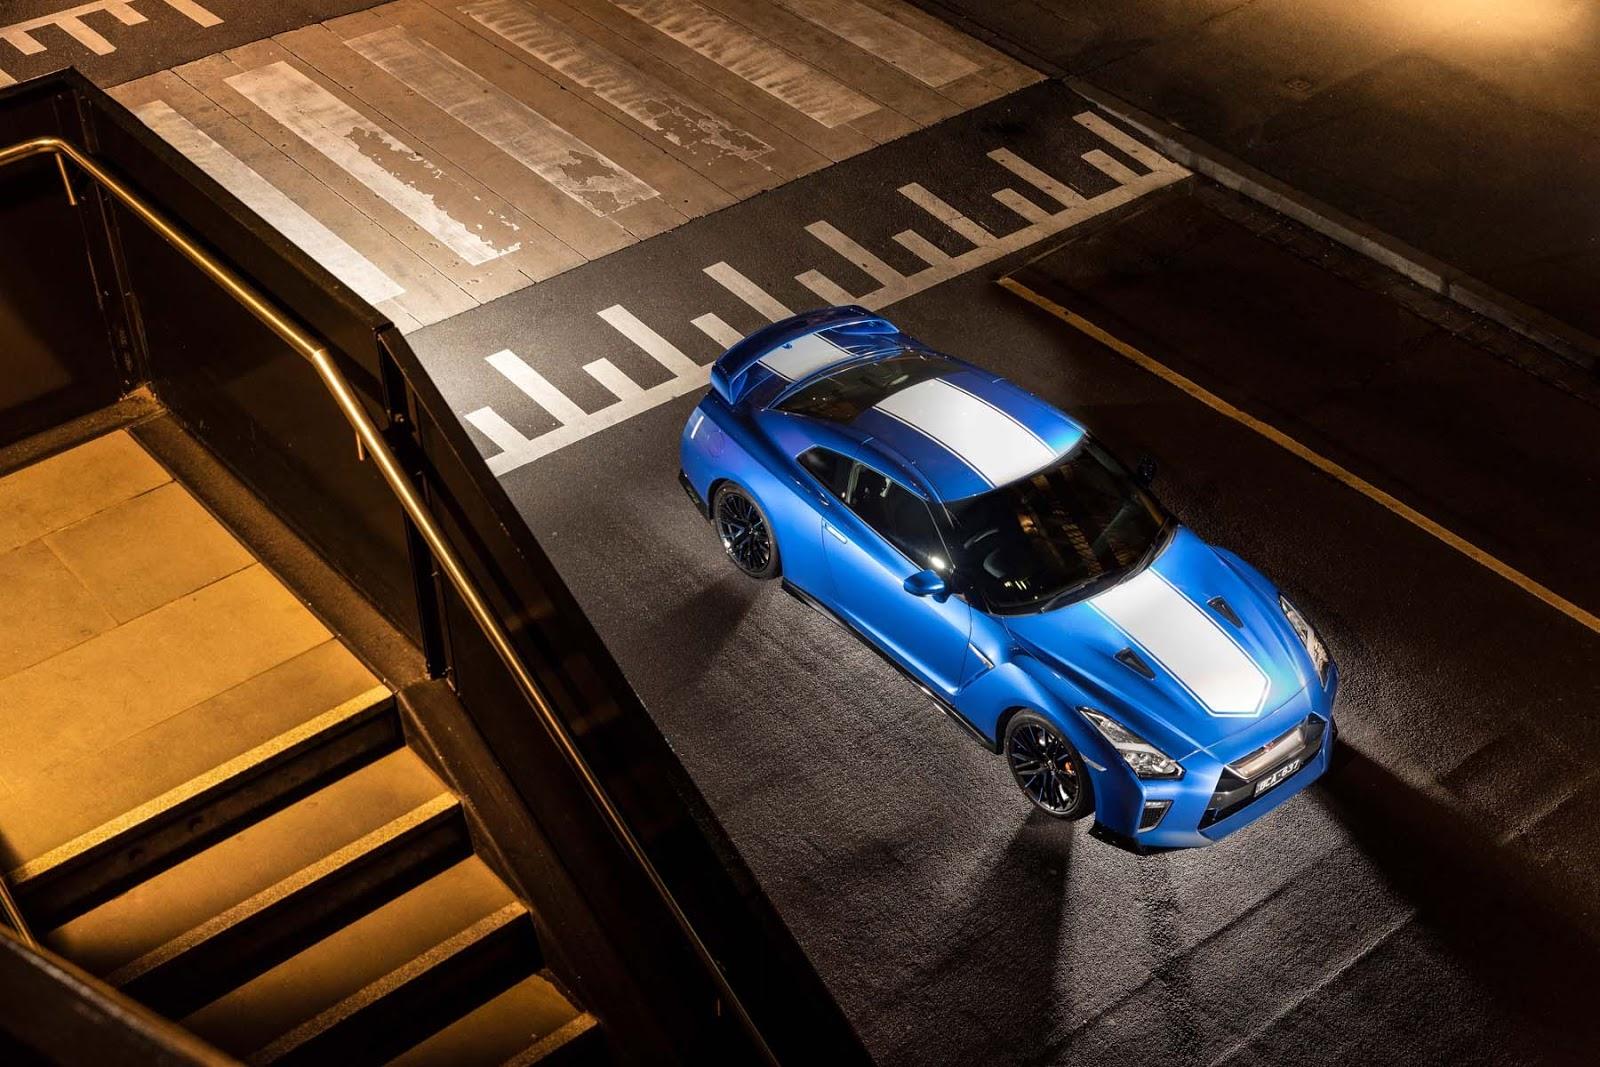 Nissan2BGT R2B50th2BAnniversary2B00005 Η Nissan Αυστραλίας έφτιαξε ένα special edition GT-R για τα 50 χρόνια του